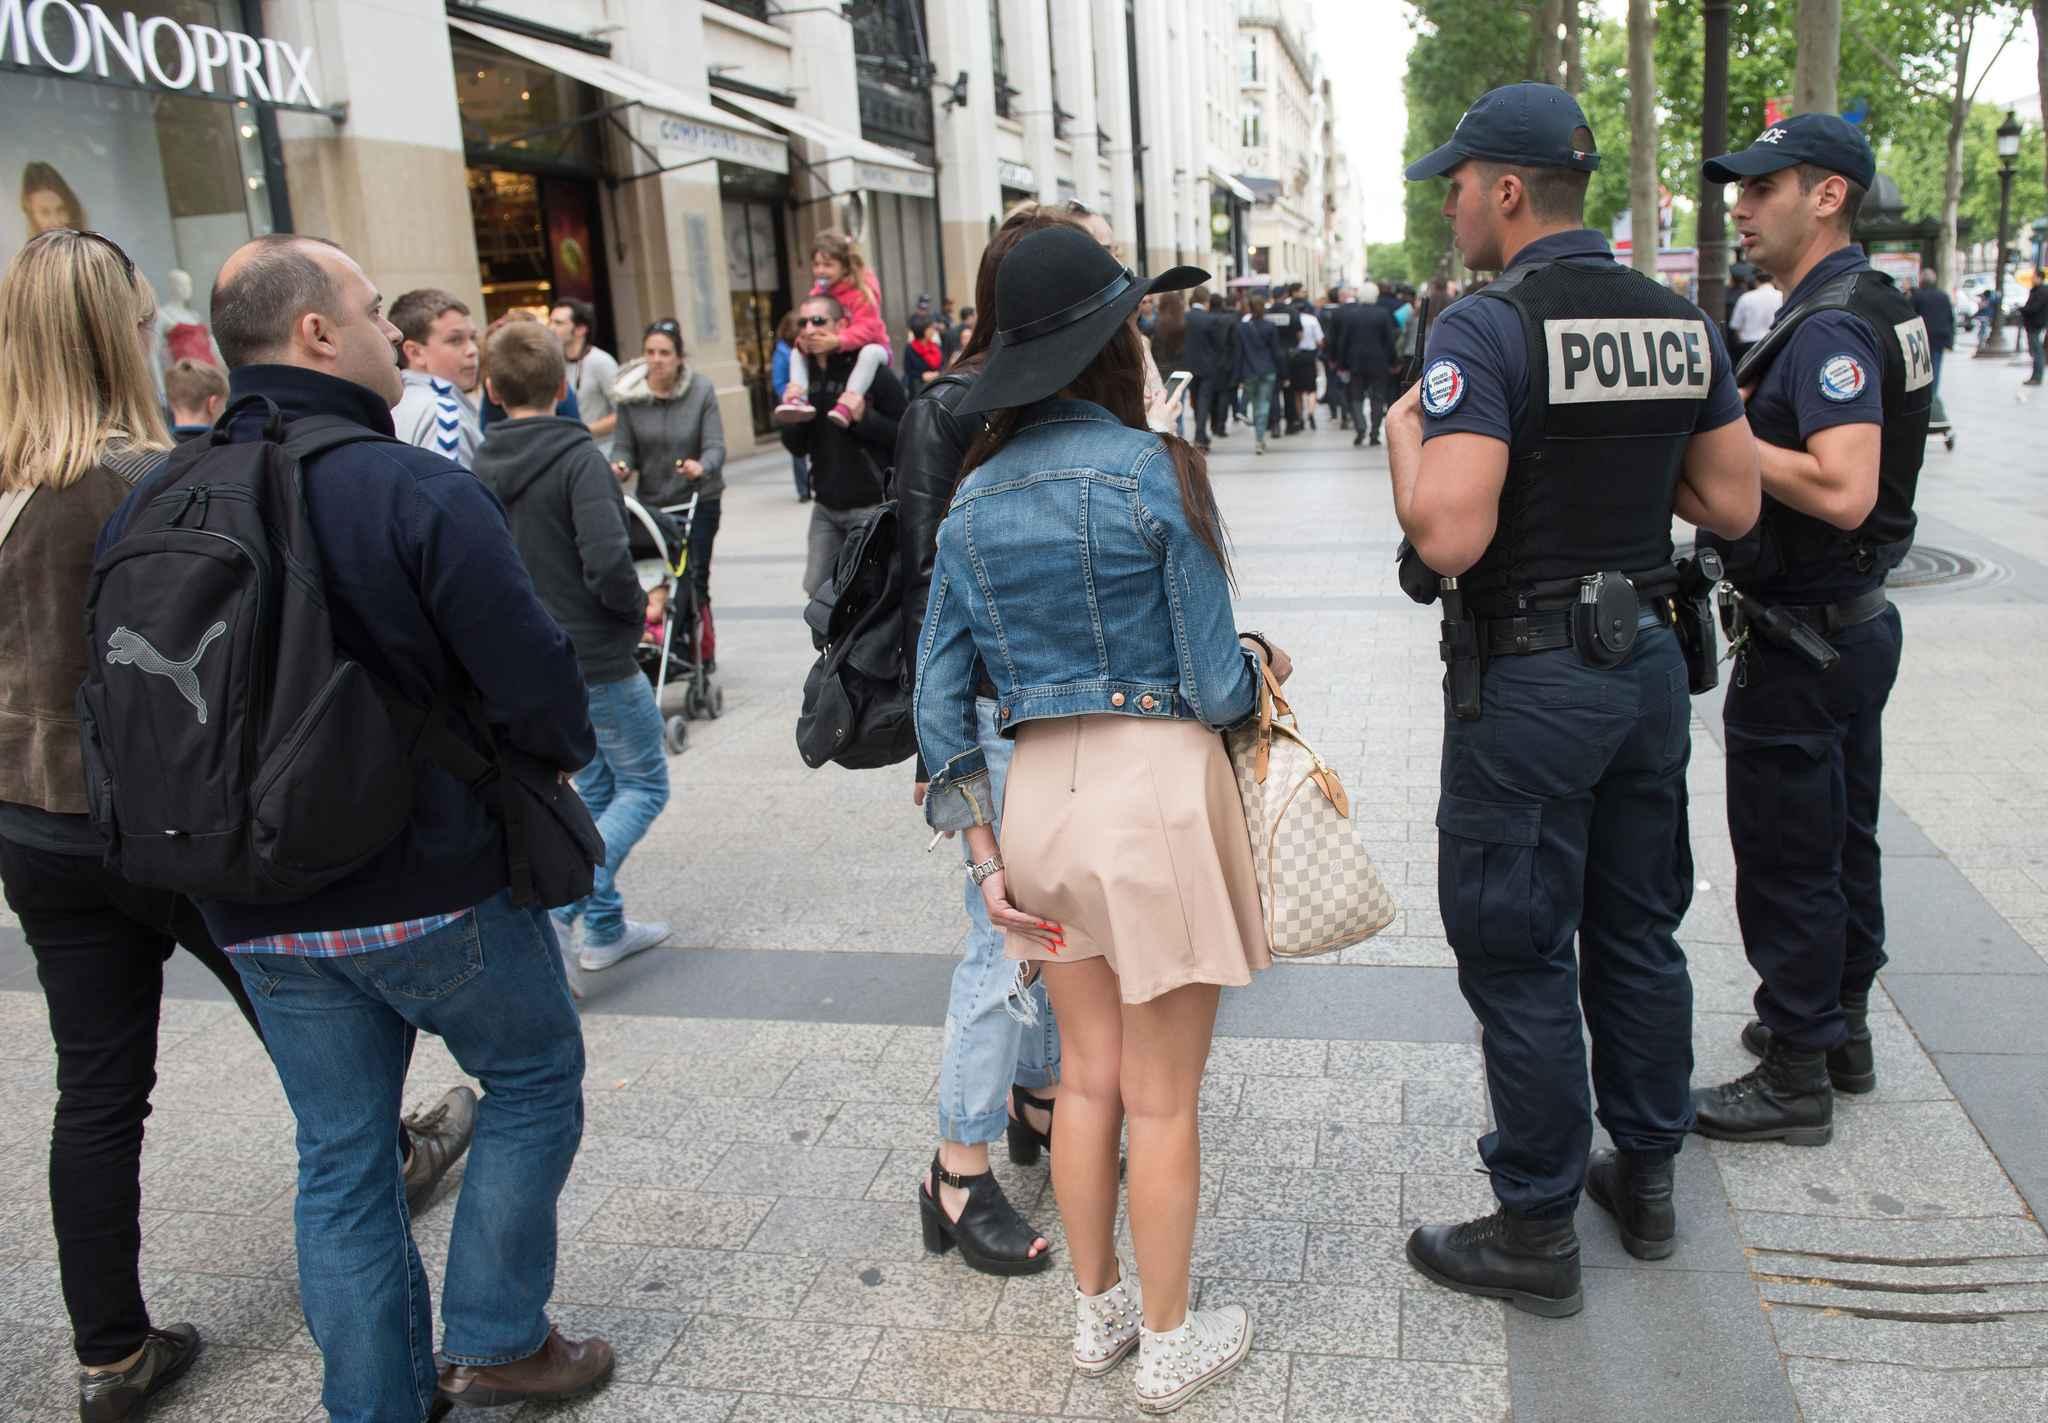 touristes sous escorte policiere marseille